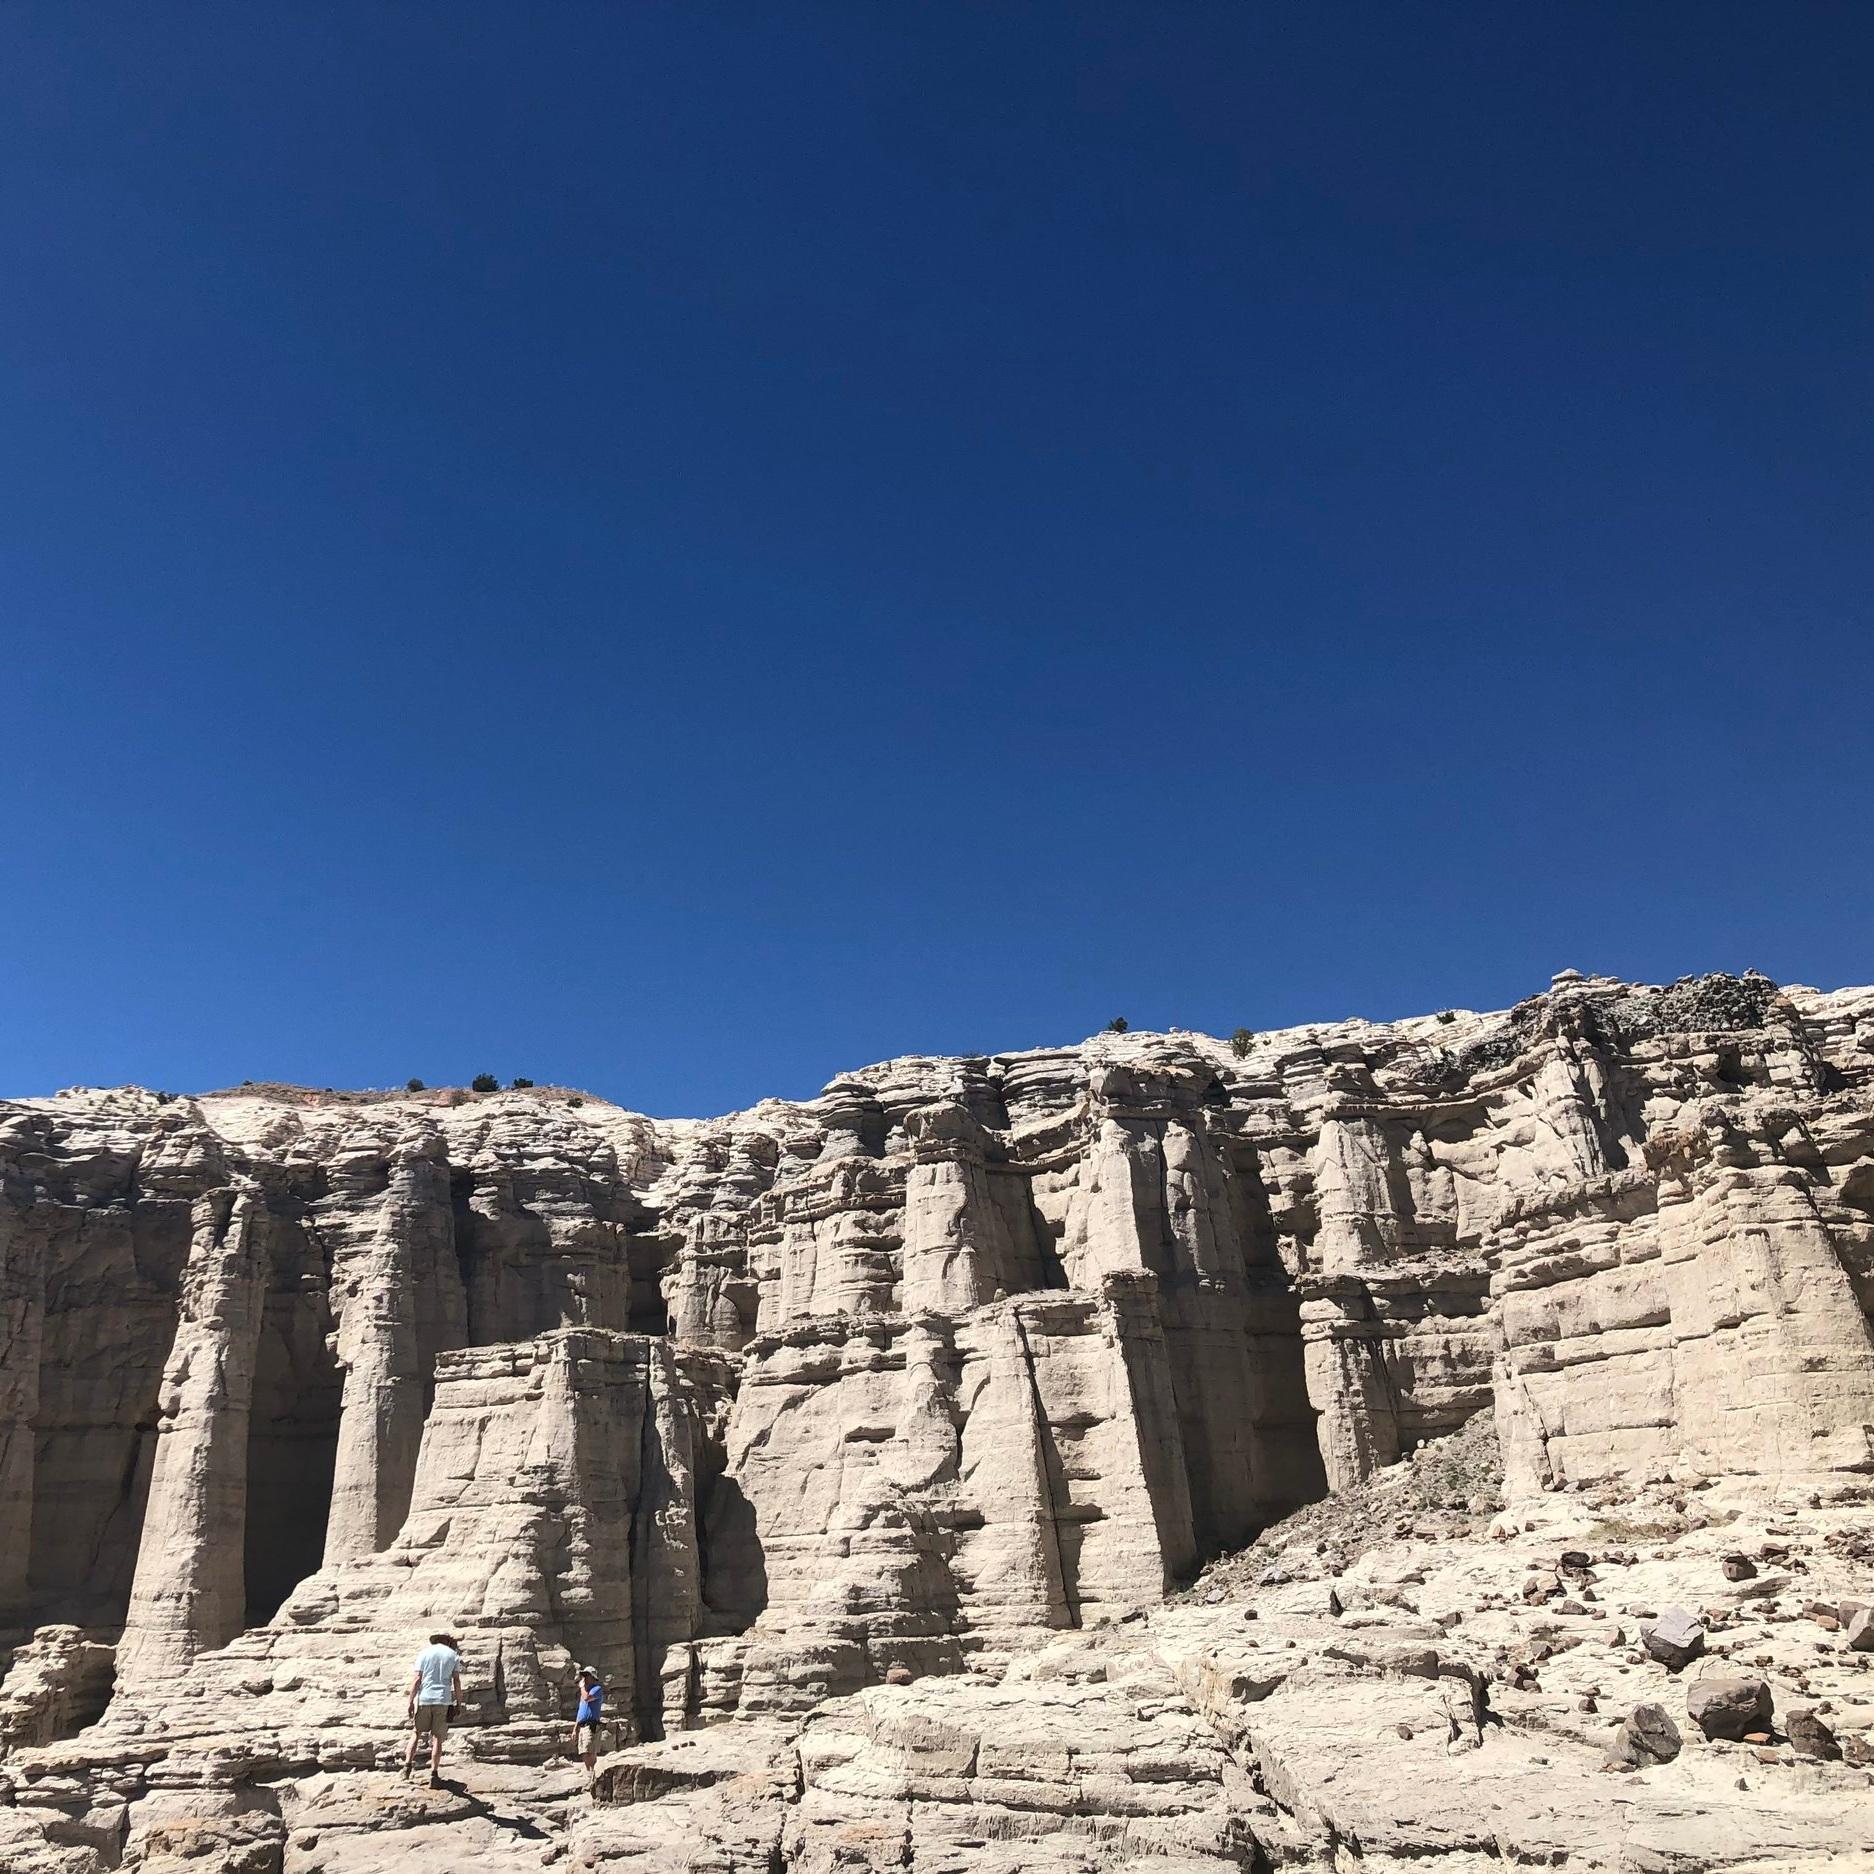 Big cliffs inspire - big writing ideas